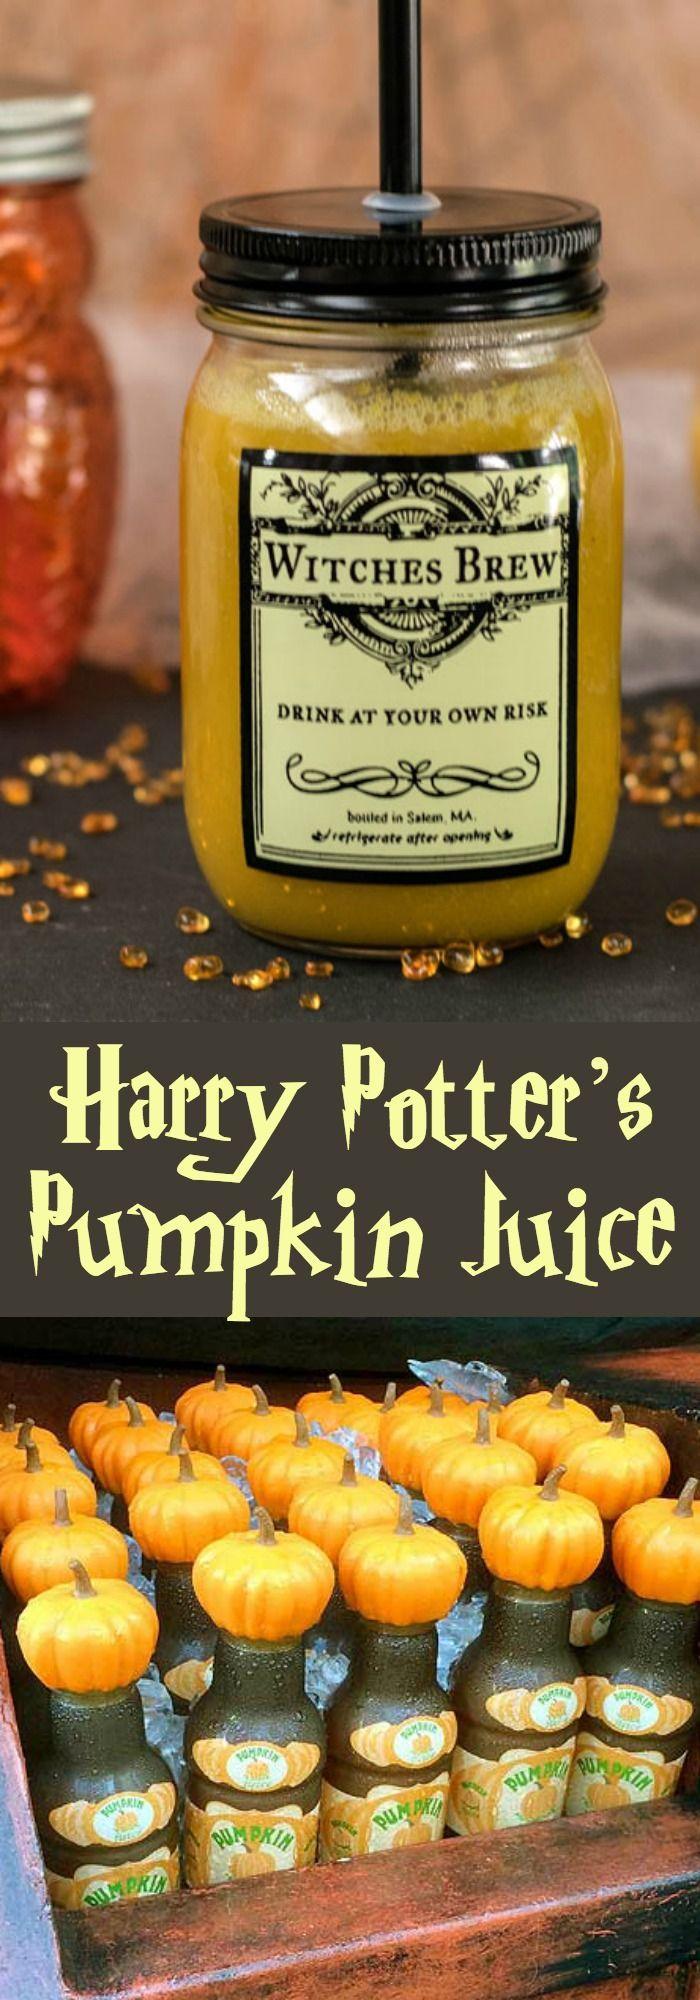 202 best Halloween images on Pinterest